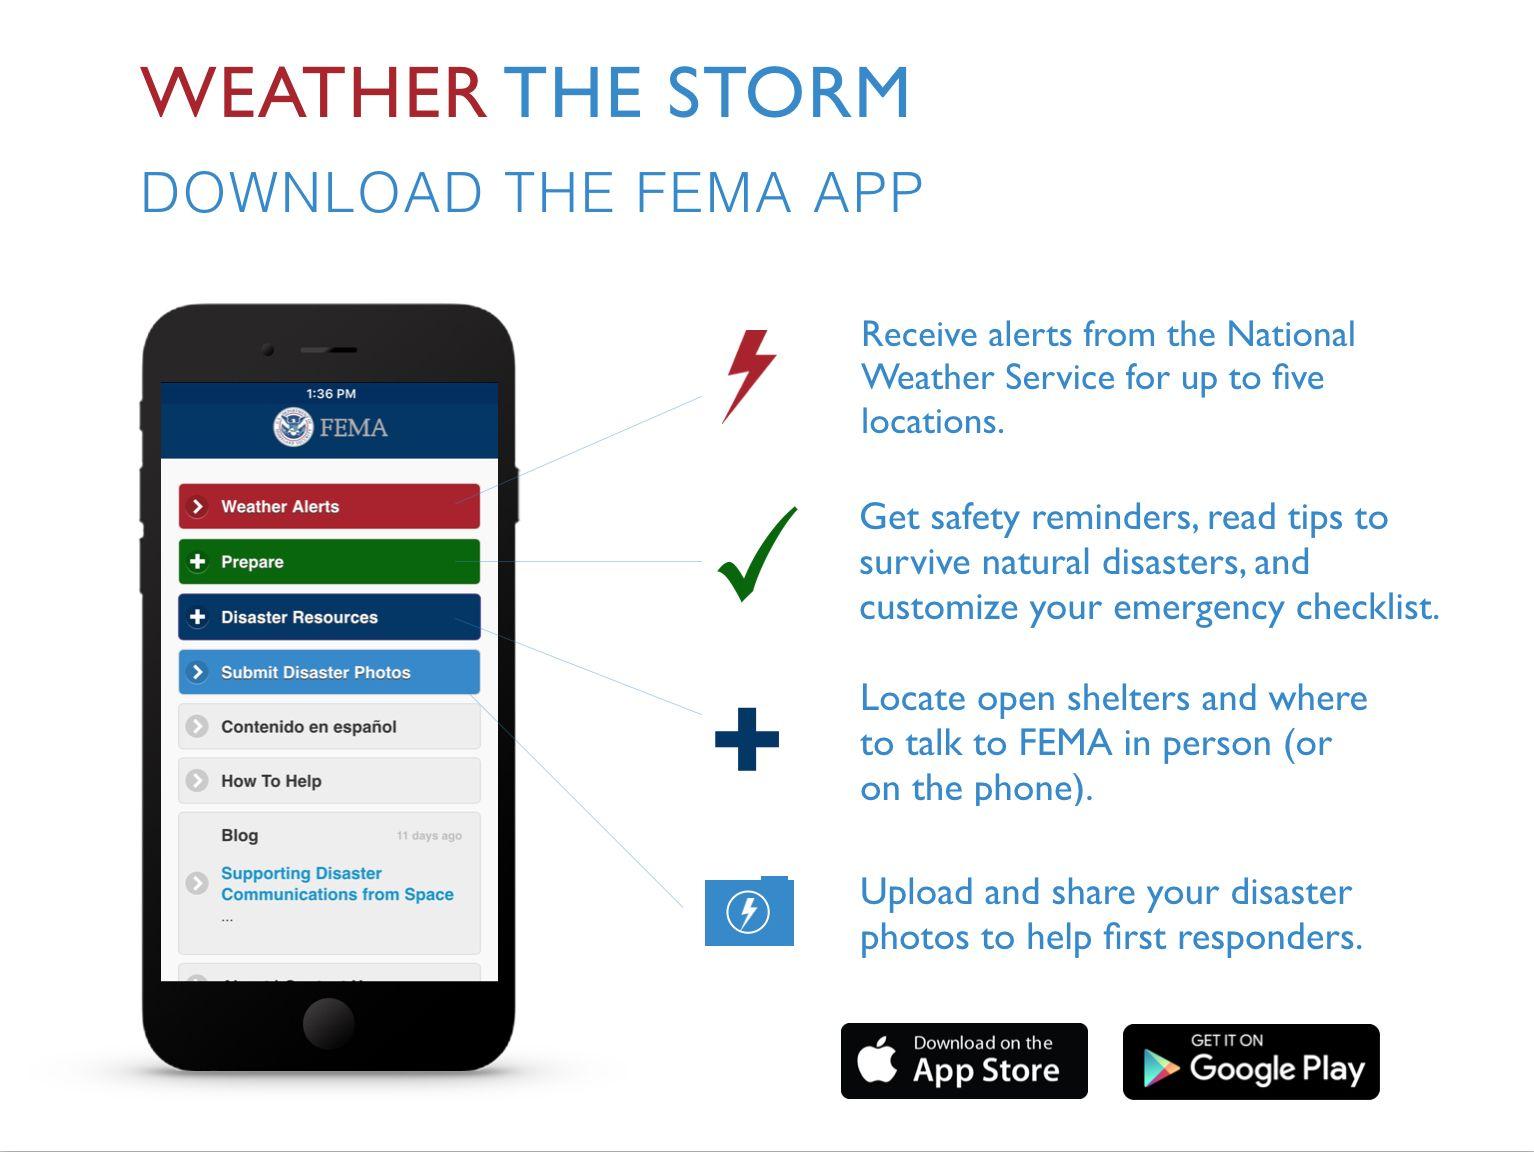 Fema App Infographic Hurricane Season Natural Disasters Weather Alerts